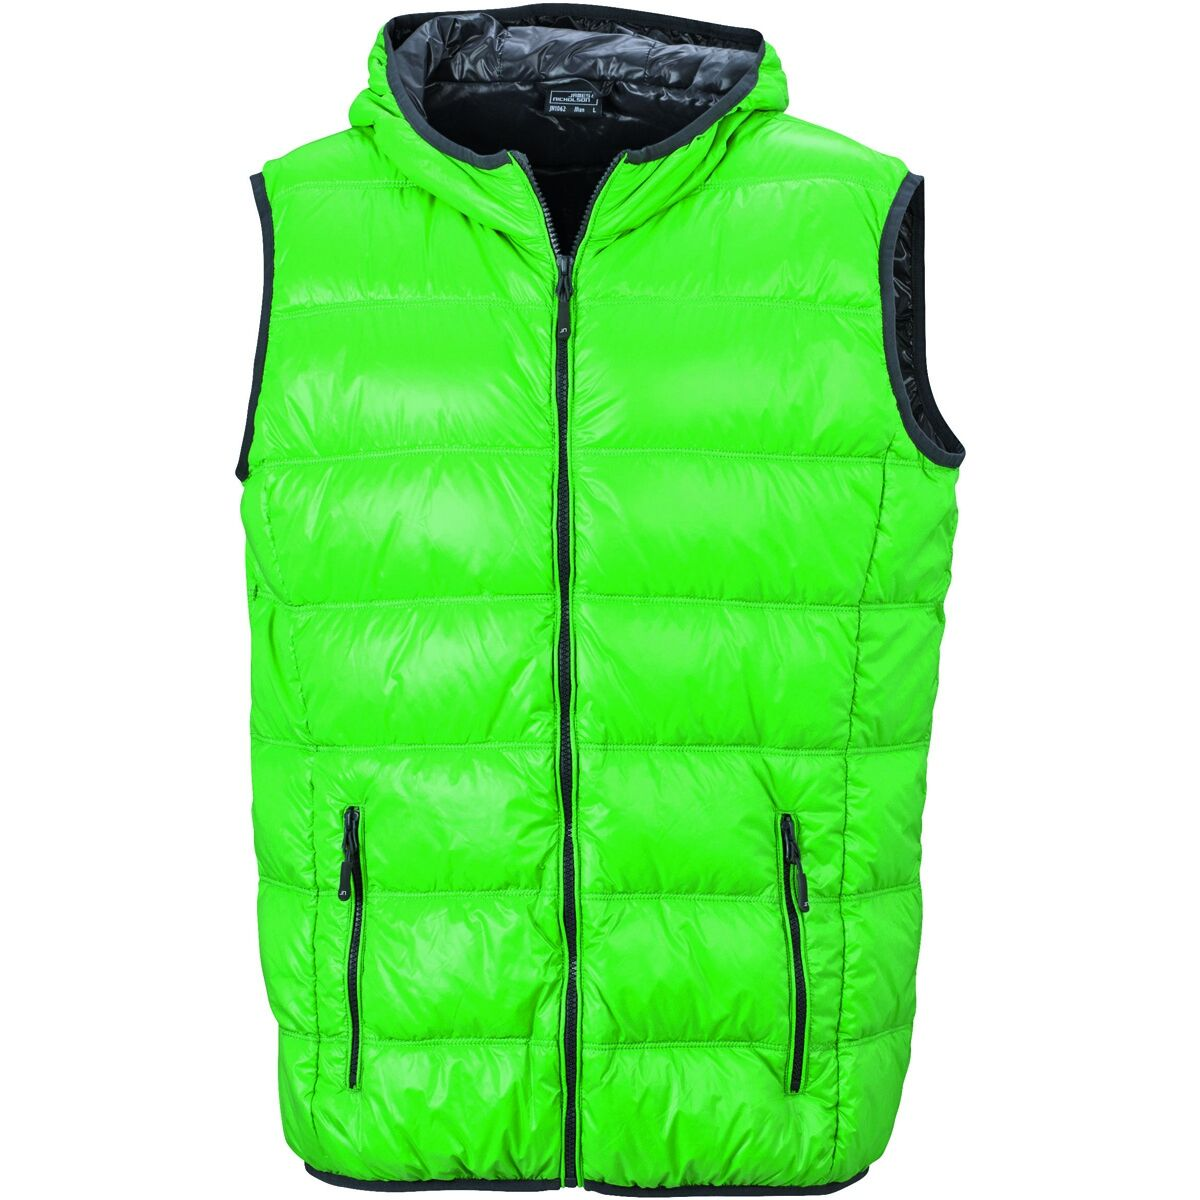 Bodywarmer duvet doudoune sans manches anorak homme - JN1062 - vert